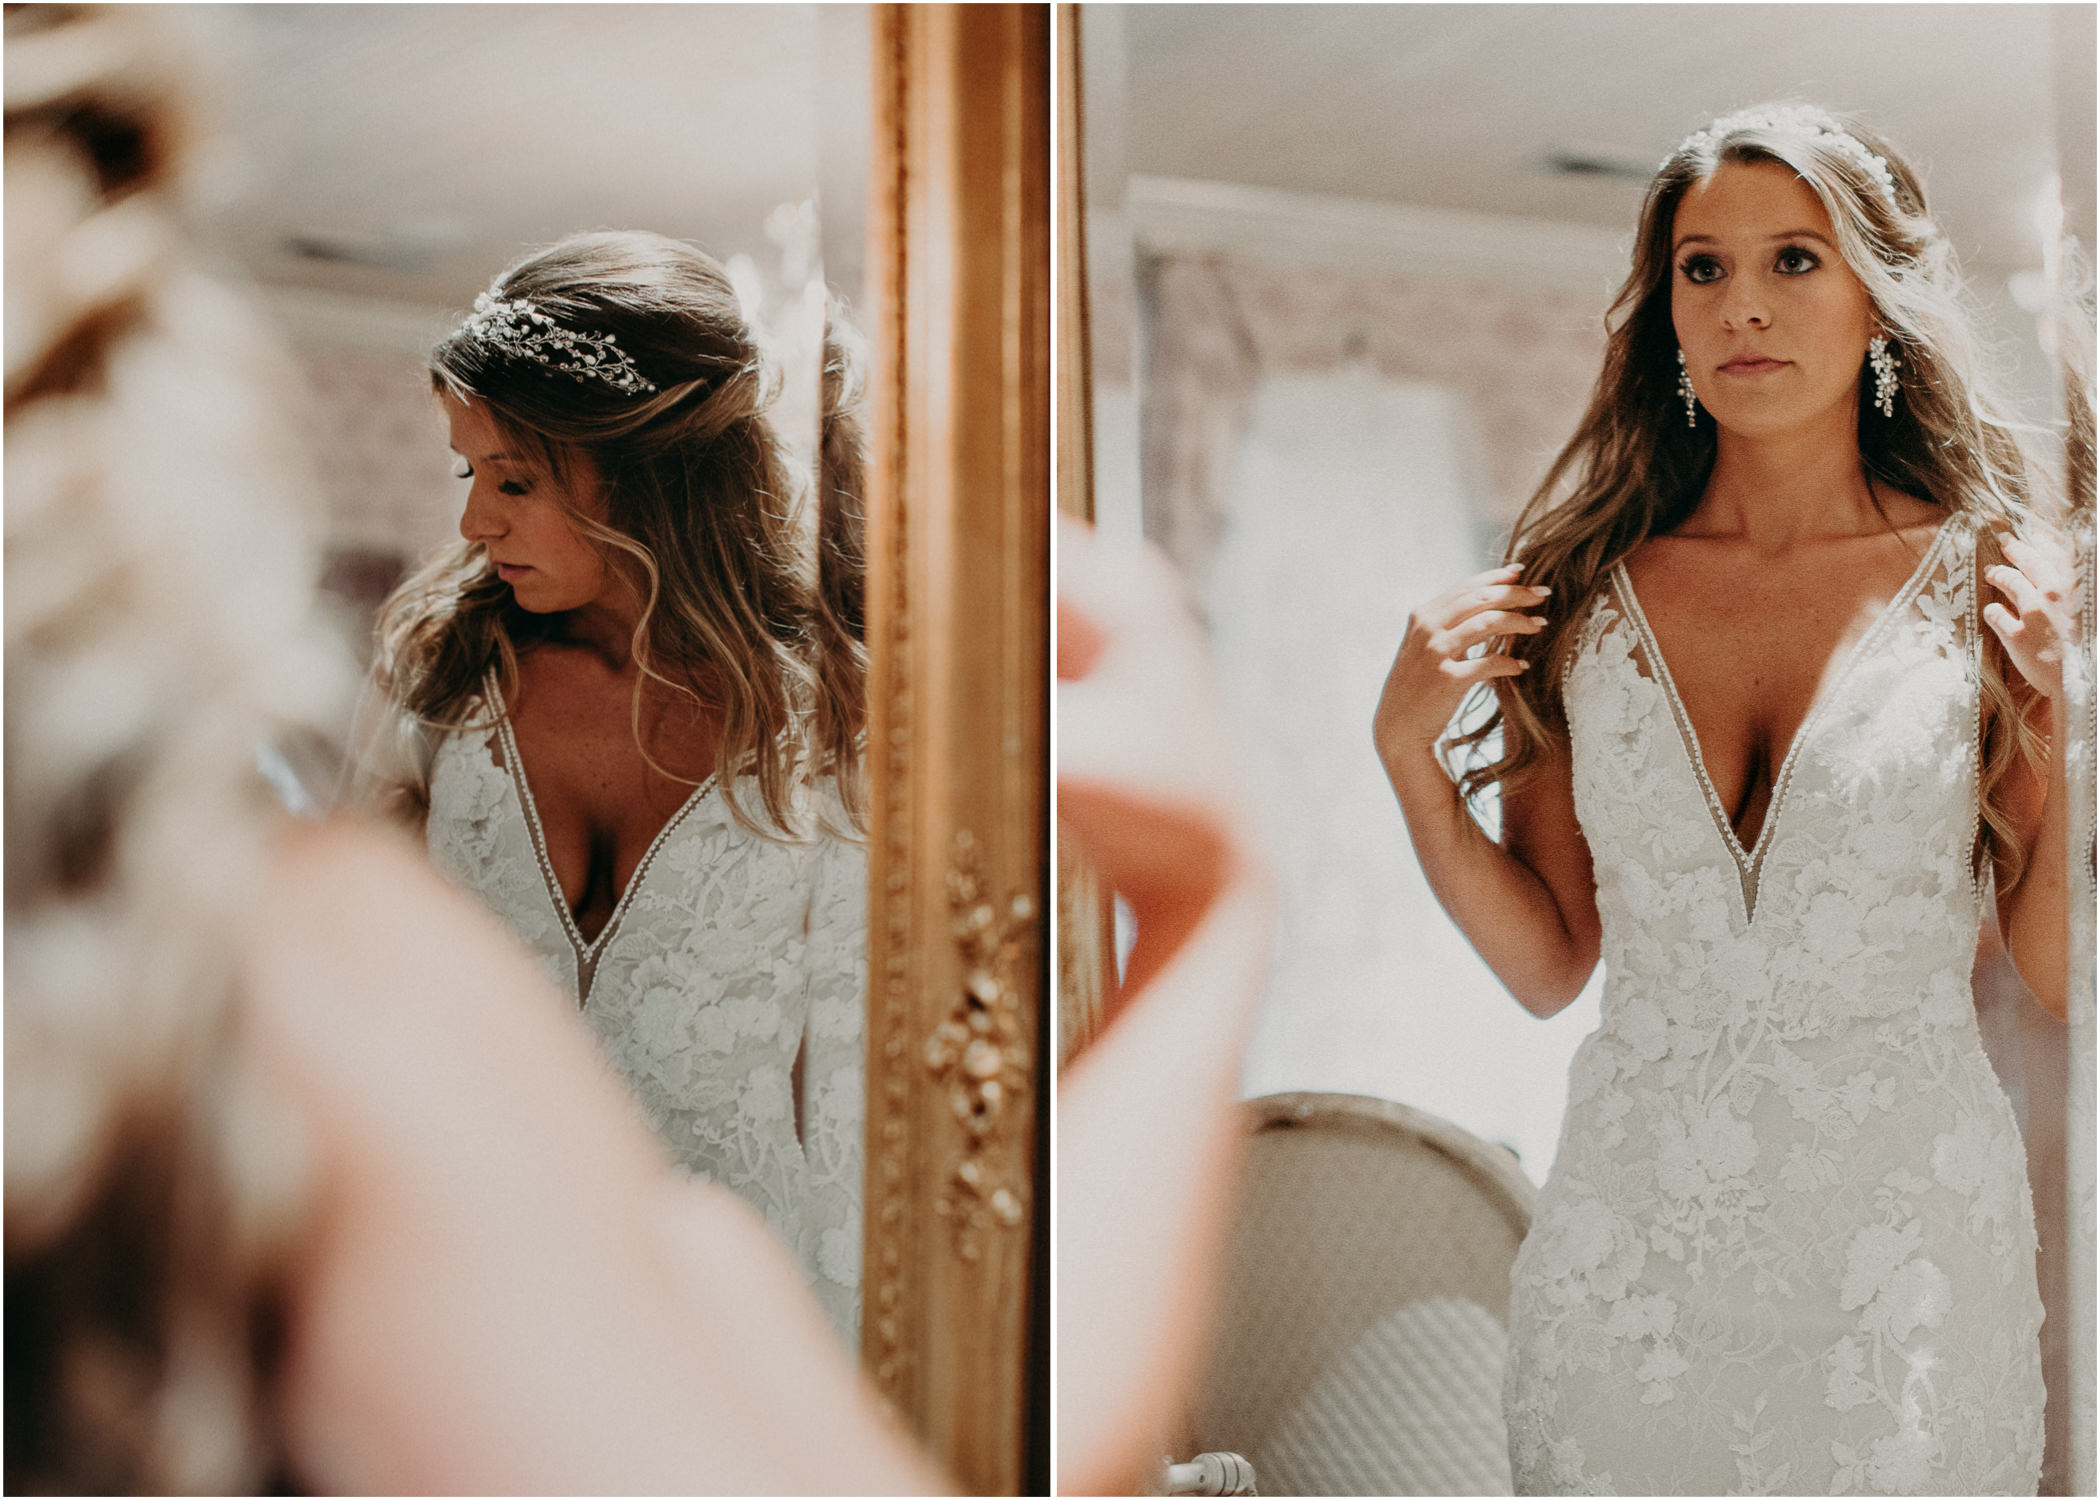 19Carl House Wedding Venue Ga, Atlanta Wedding Photographer - Boho, Bohemian, Junebug Weddings, Vintage, Retro, Trendy. Aline Marin Photography. .jpg